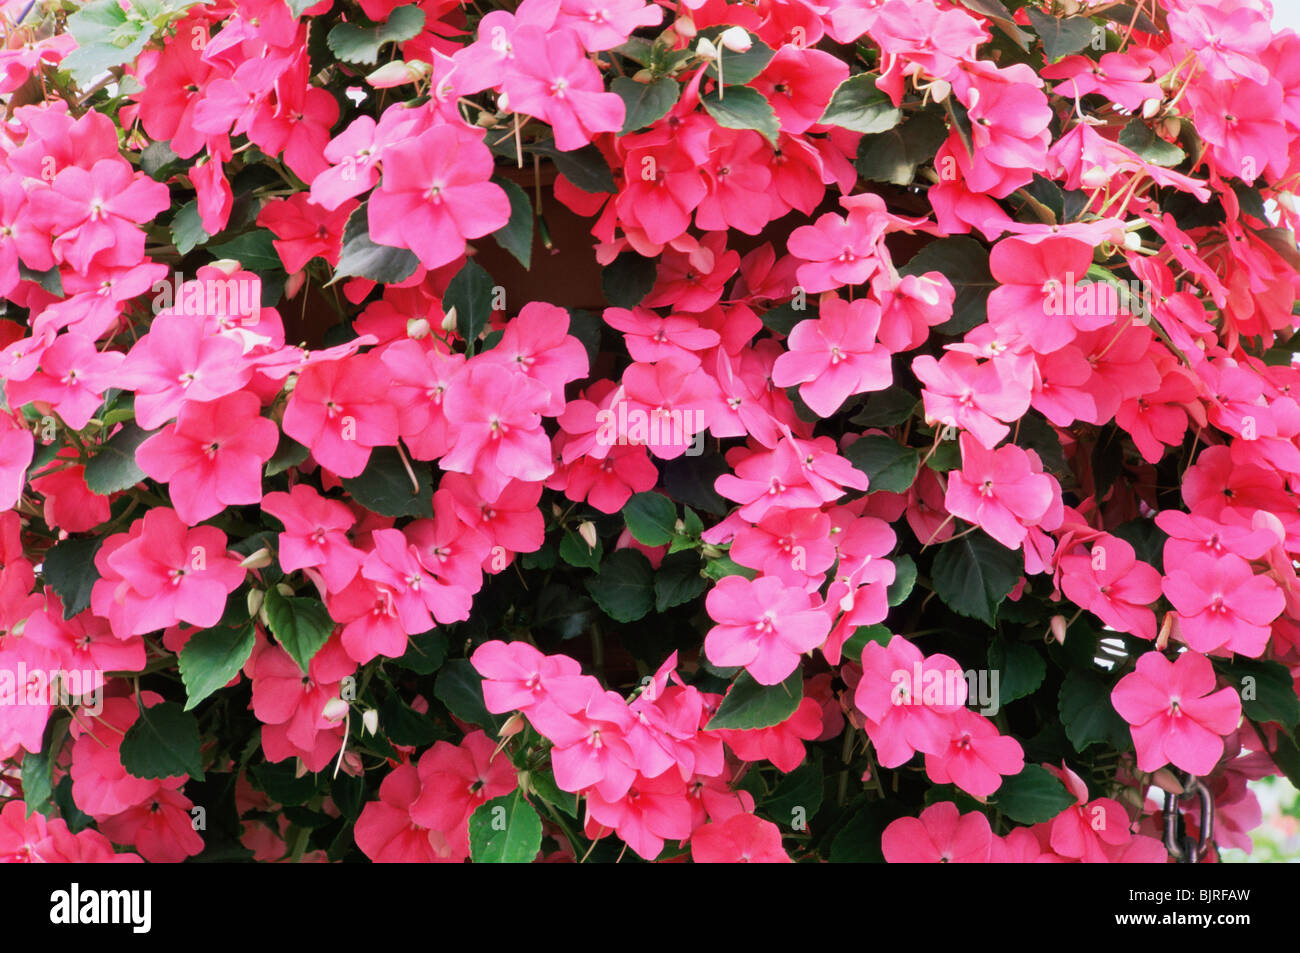 New Guinea Impatiens Flowers Stock Photo 28791137 Alamy